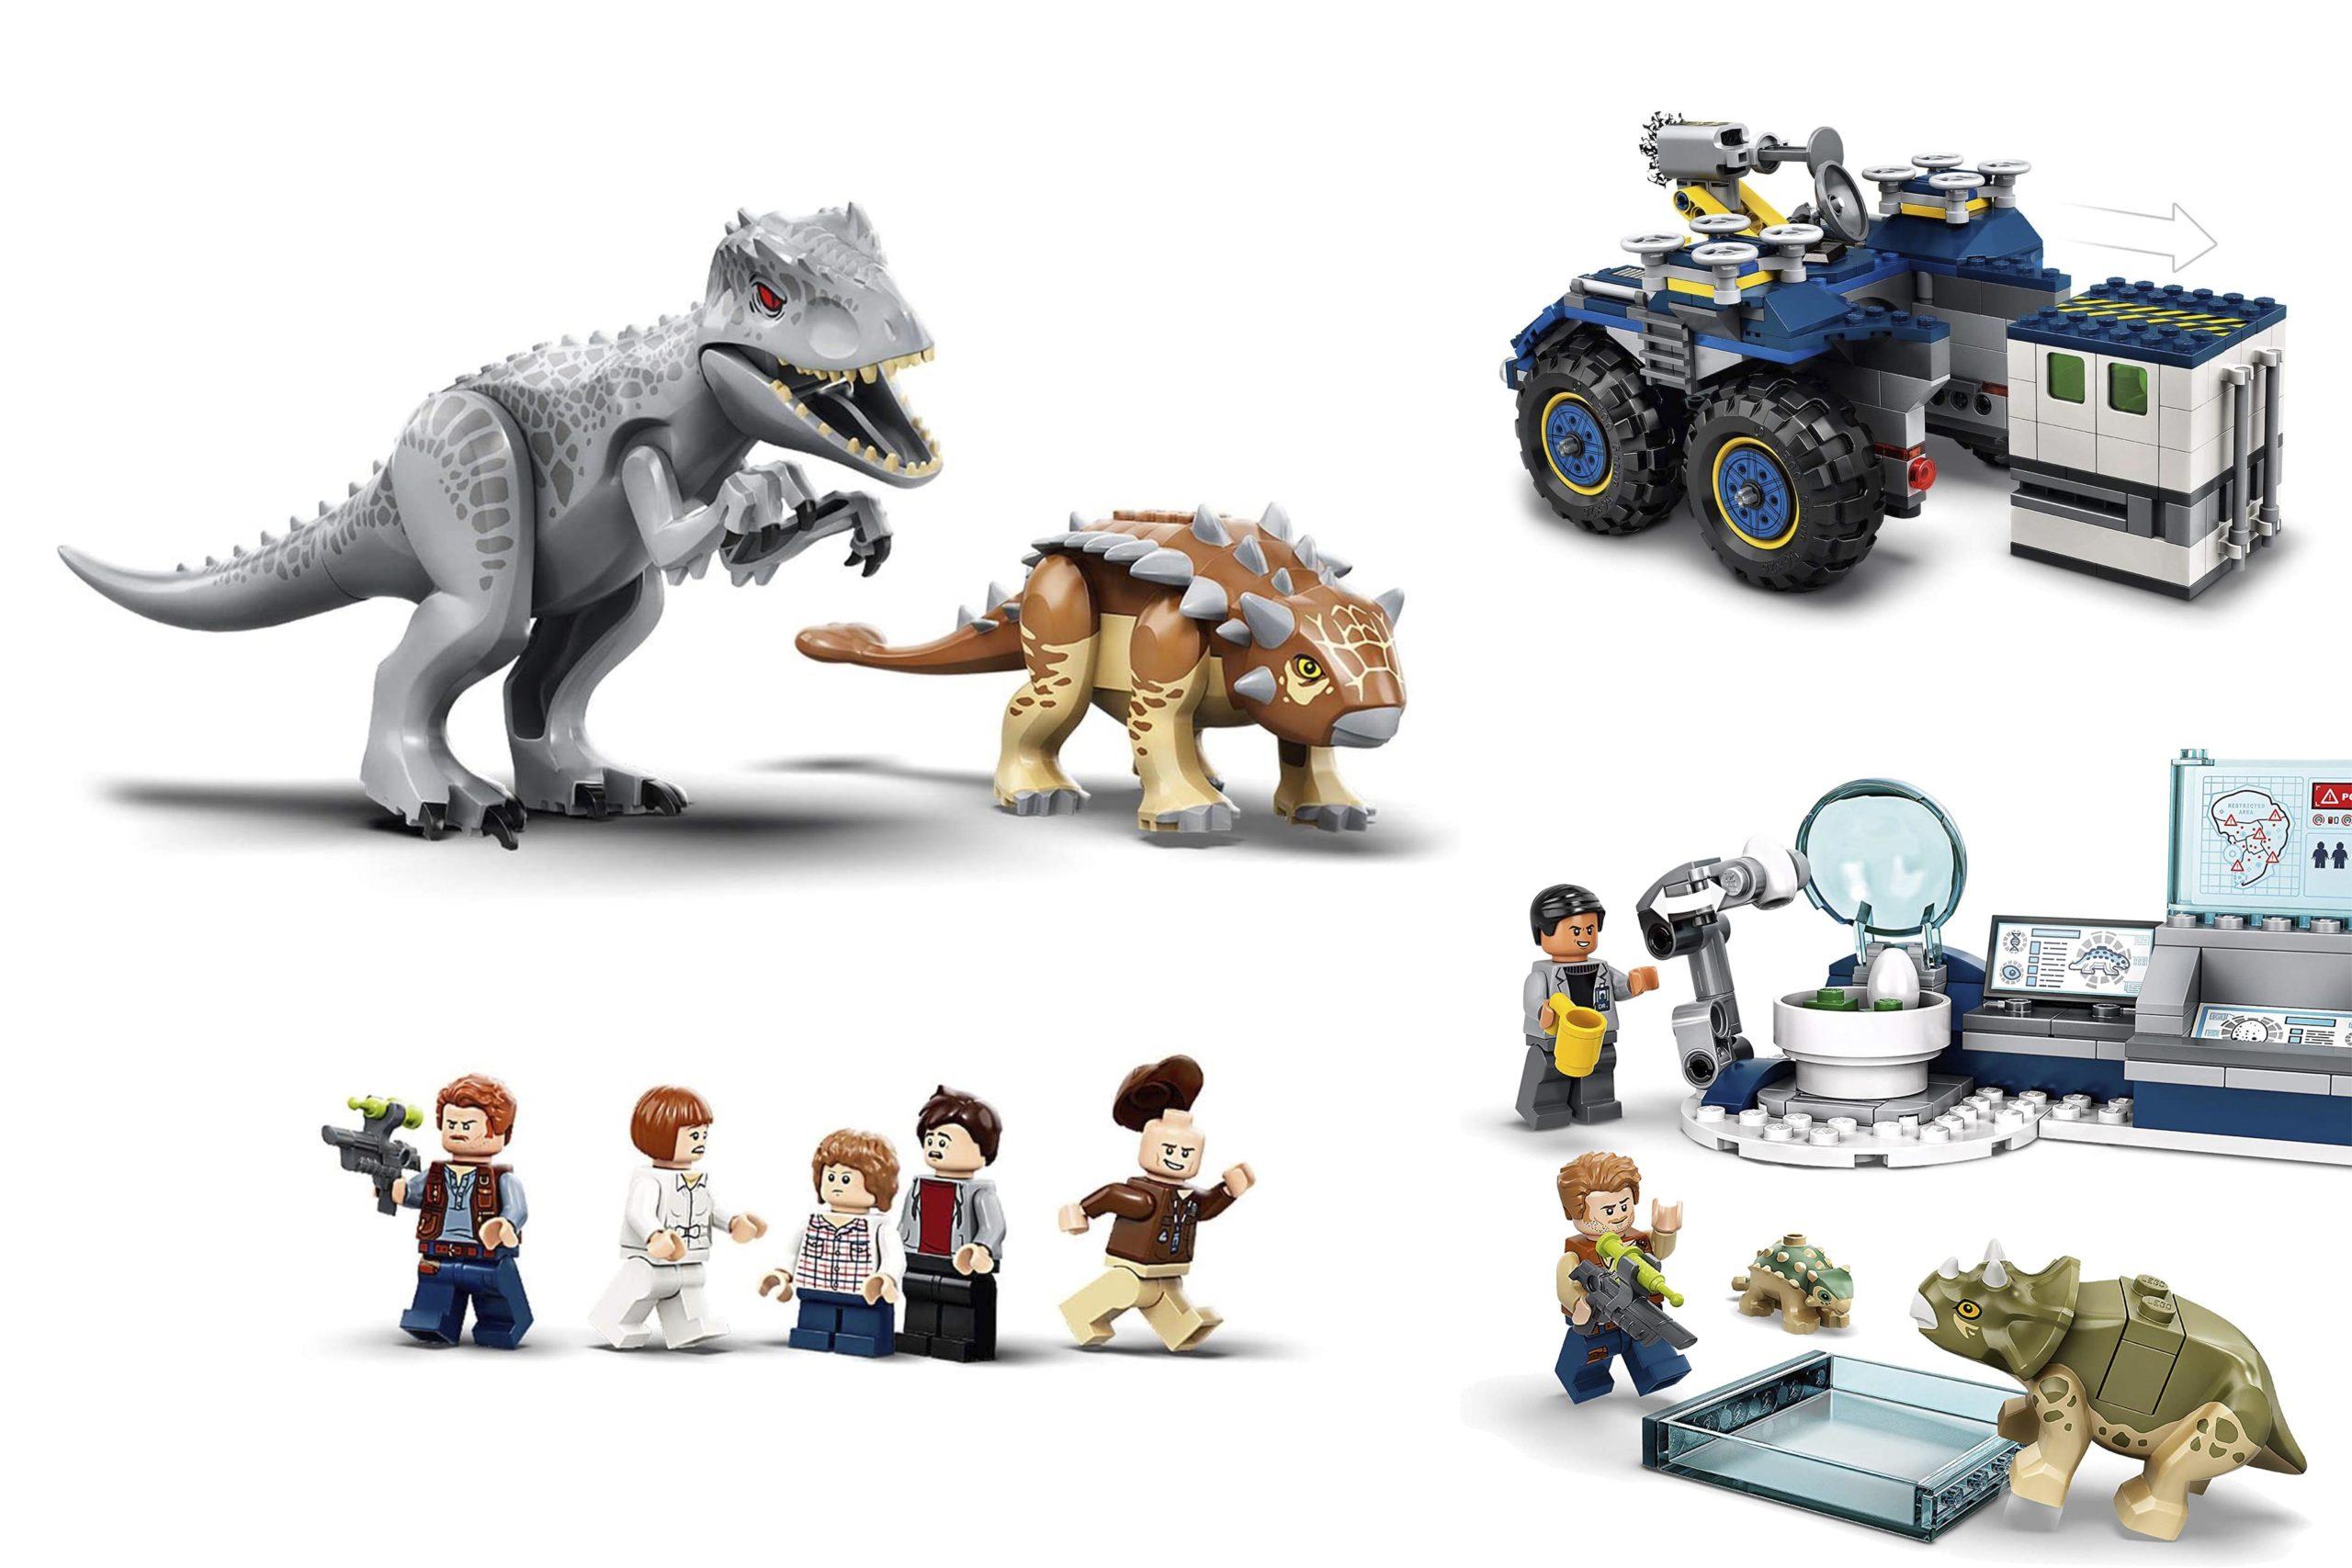 LEGO Jurassic World 2020 Footer Image